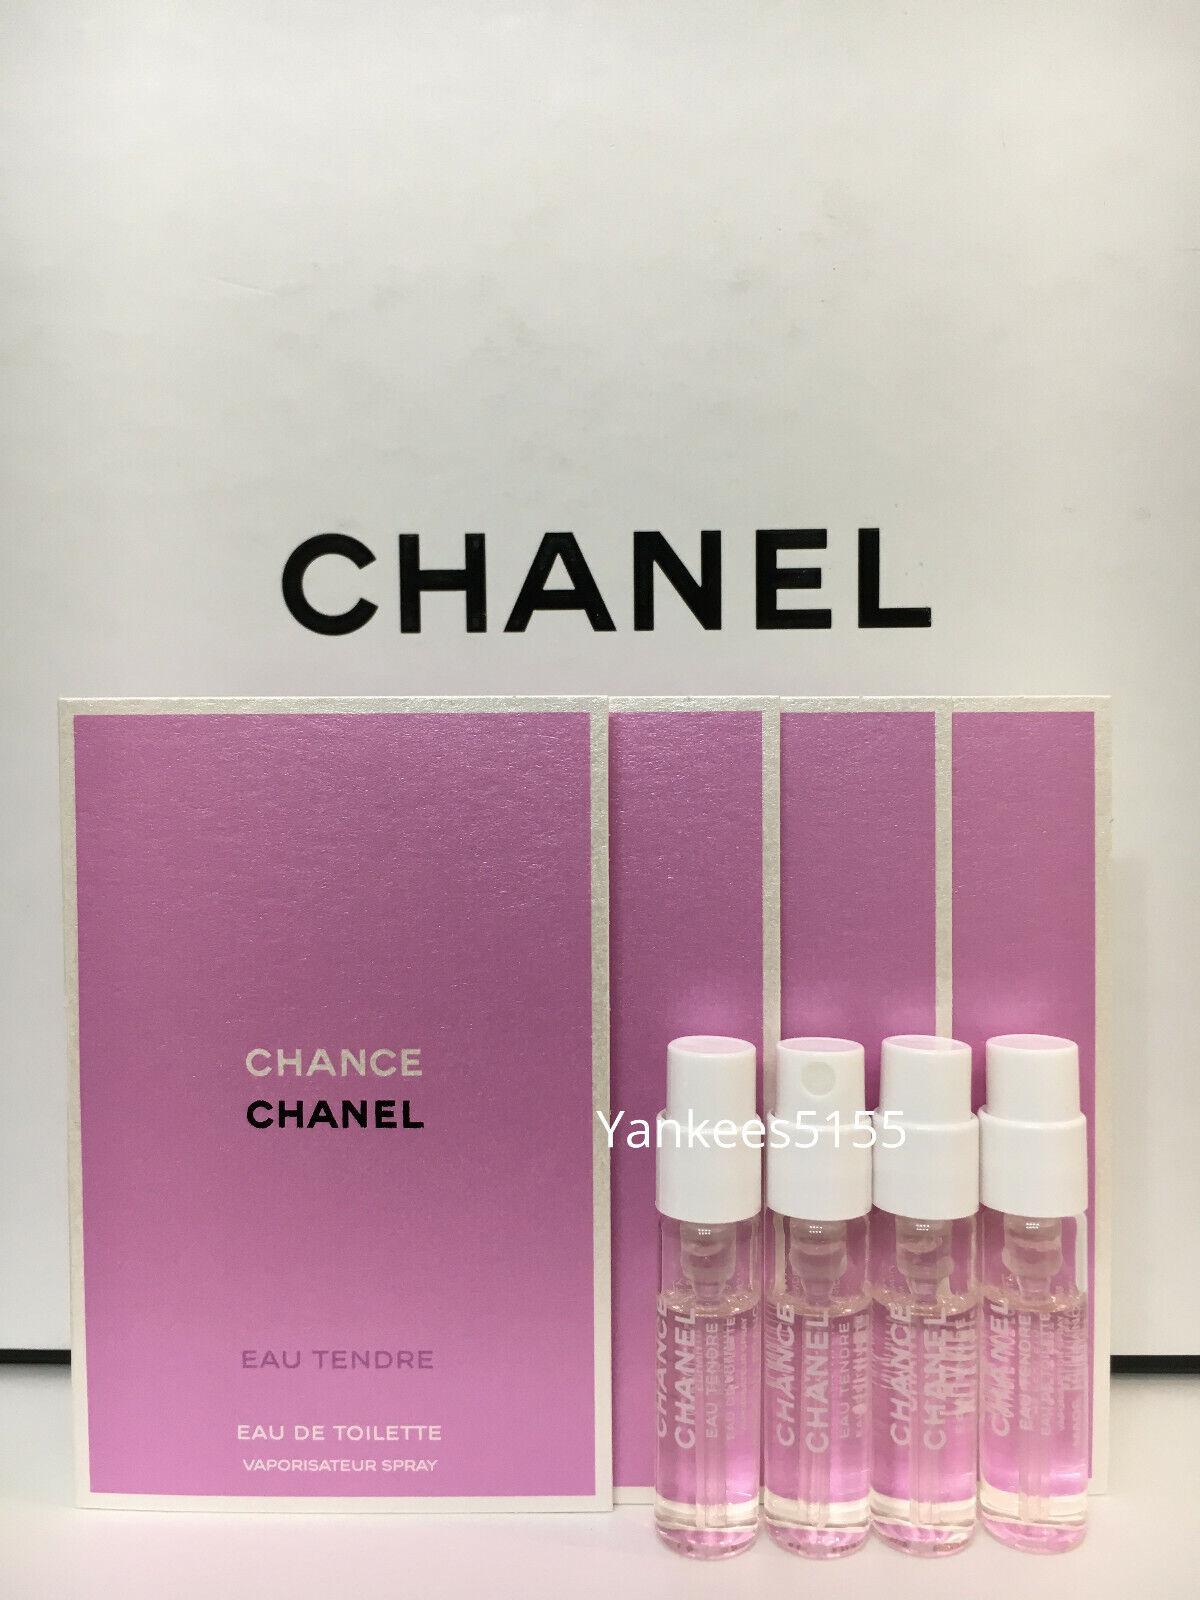 4 x Chanel Chance Eau Tendre EDT Sample Spray 15ml 005oz each